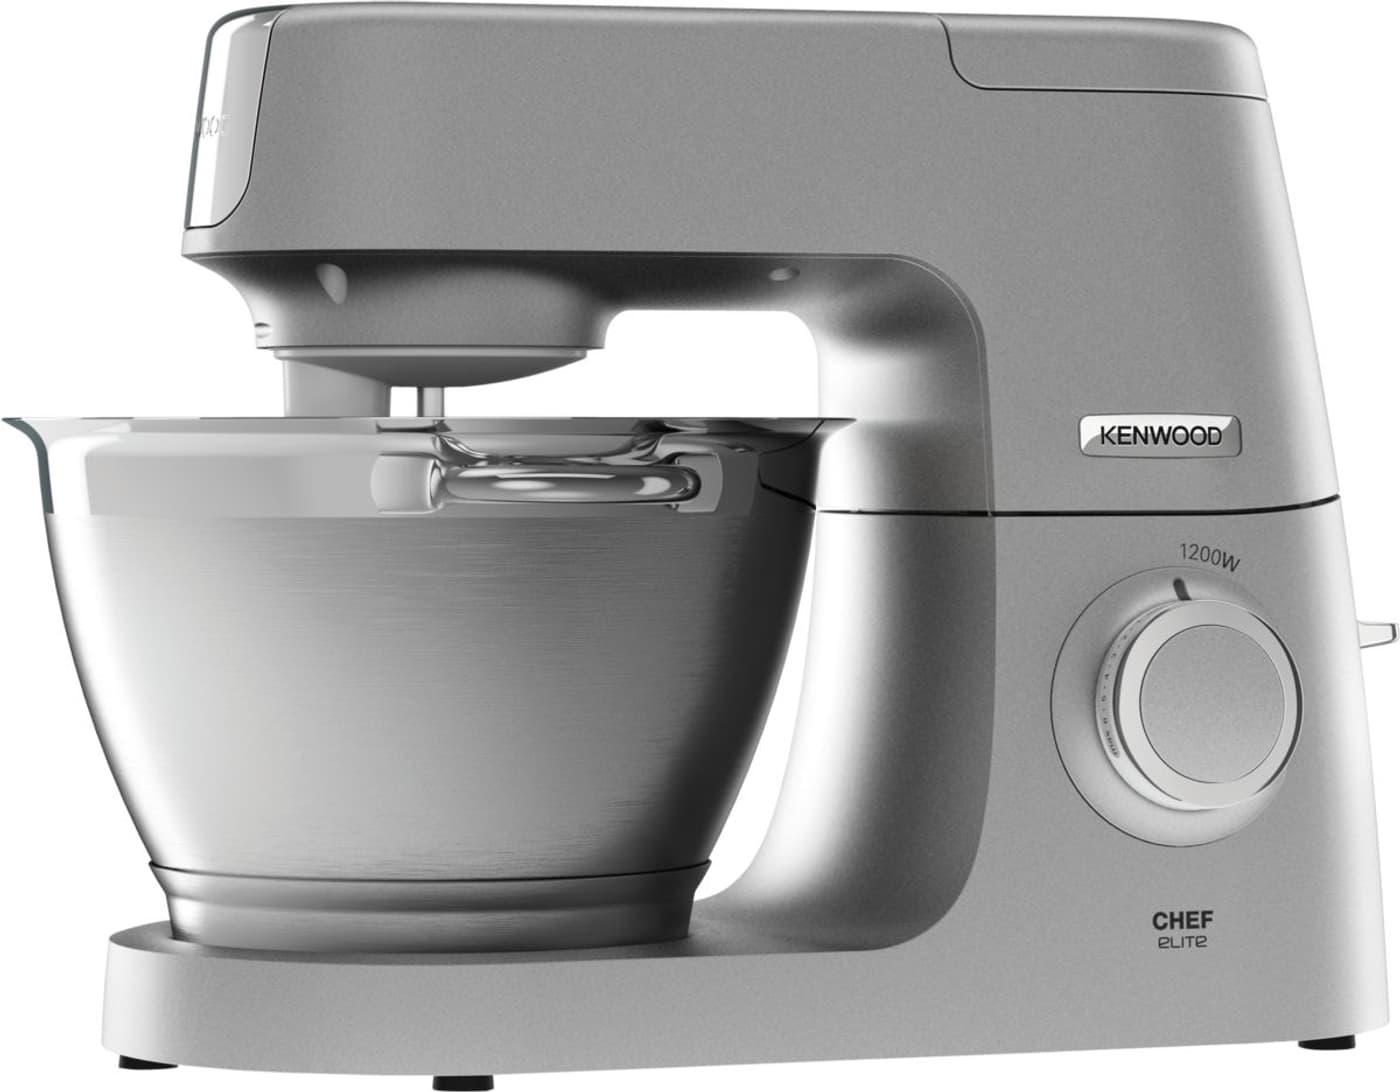 Kenwood Chef Elite KVC5300 Robot da cucina Set con AT340 & AT312 ...